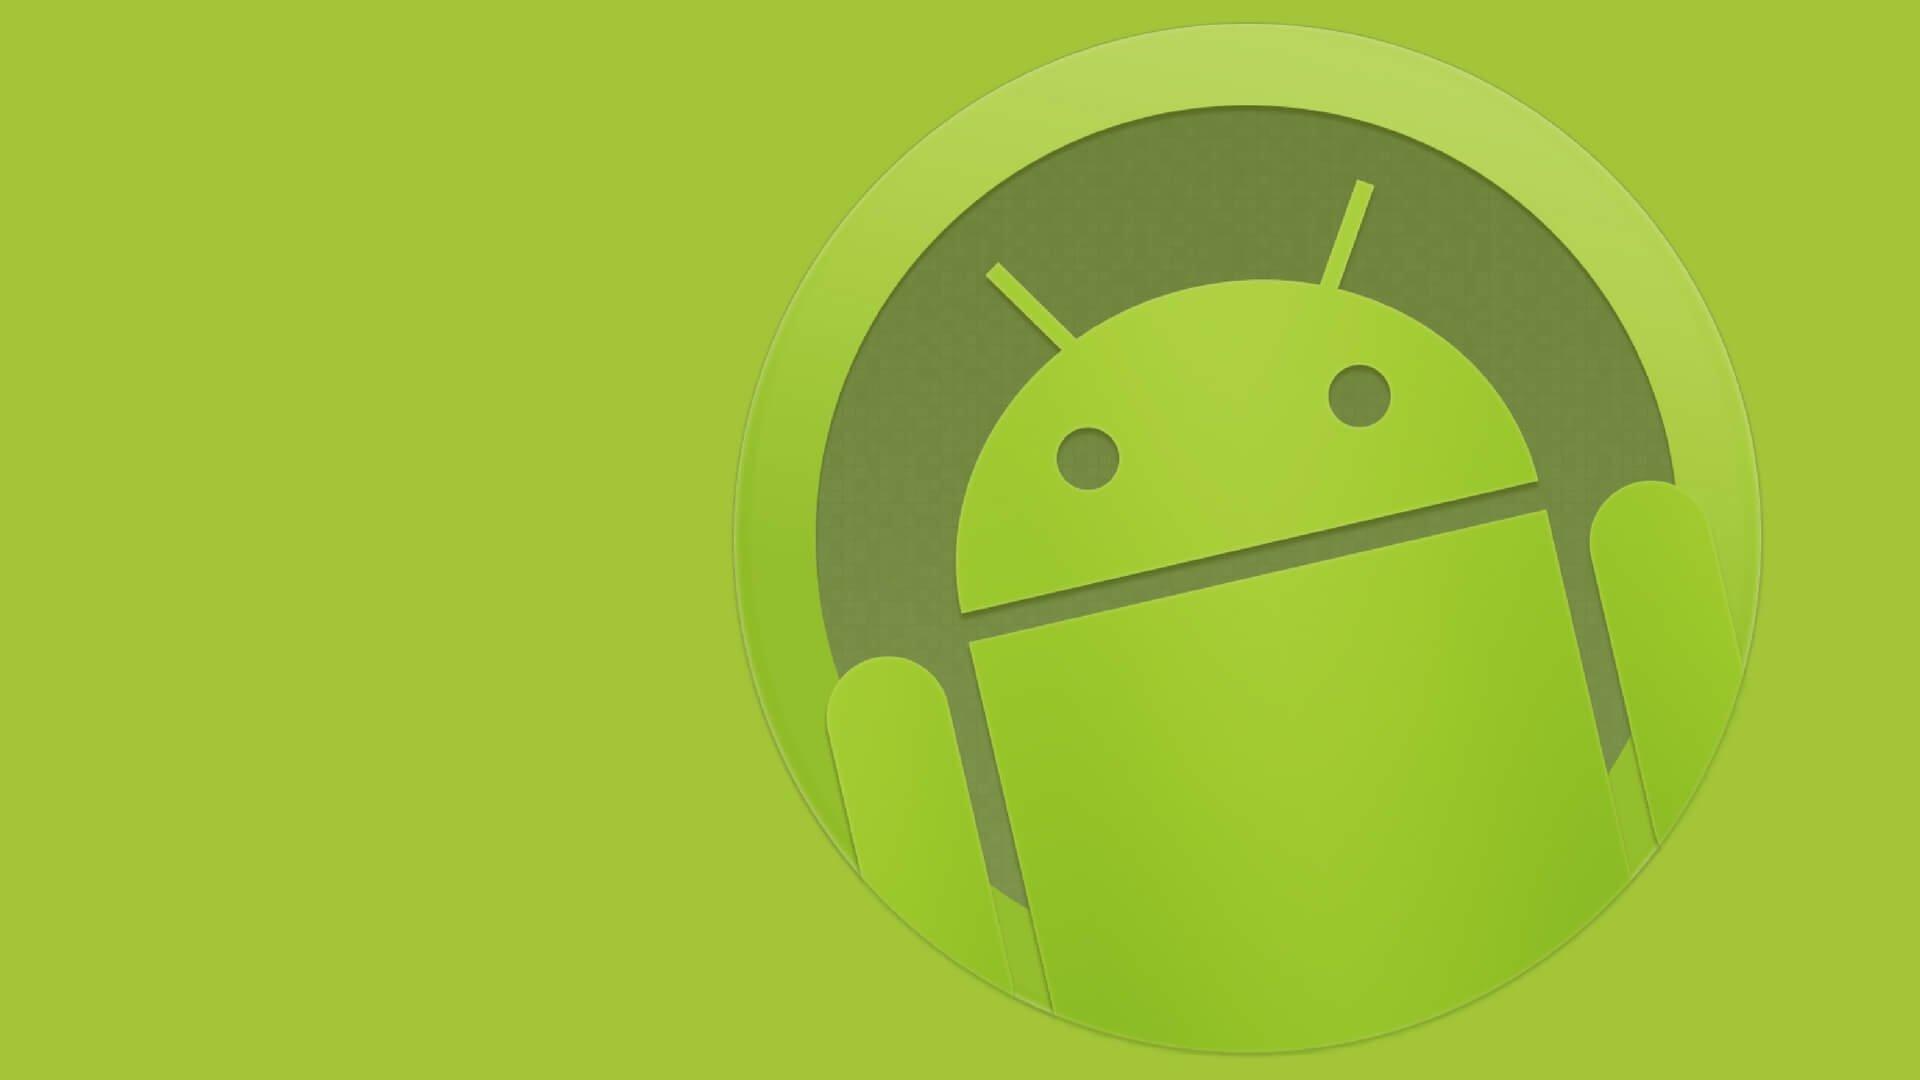 Sammlung: Android Stock Wallpaper aktueller Smartphones